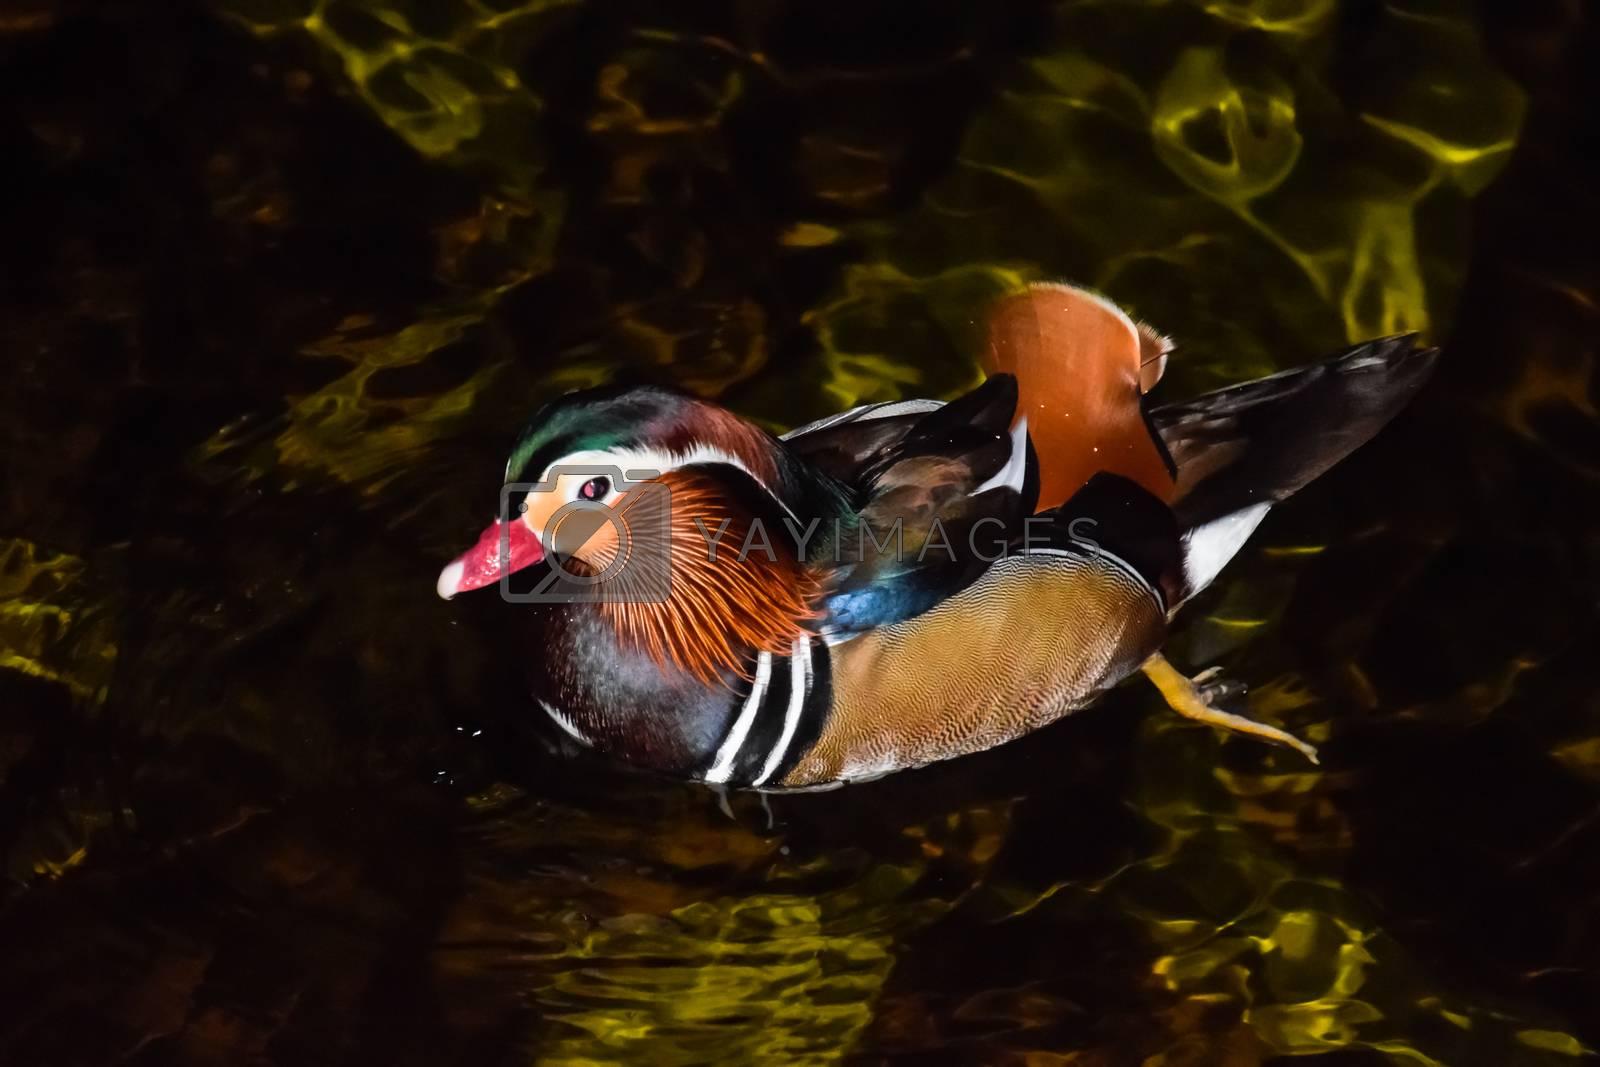 Mandarin Duck, a beautiful bird in the pond.